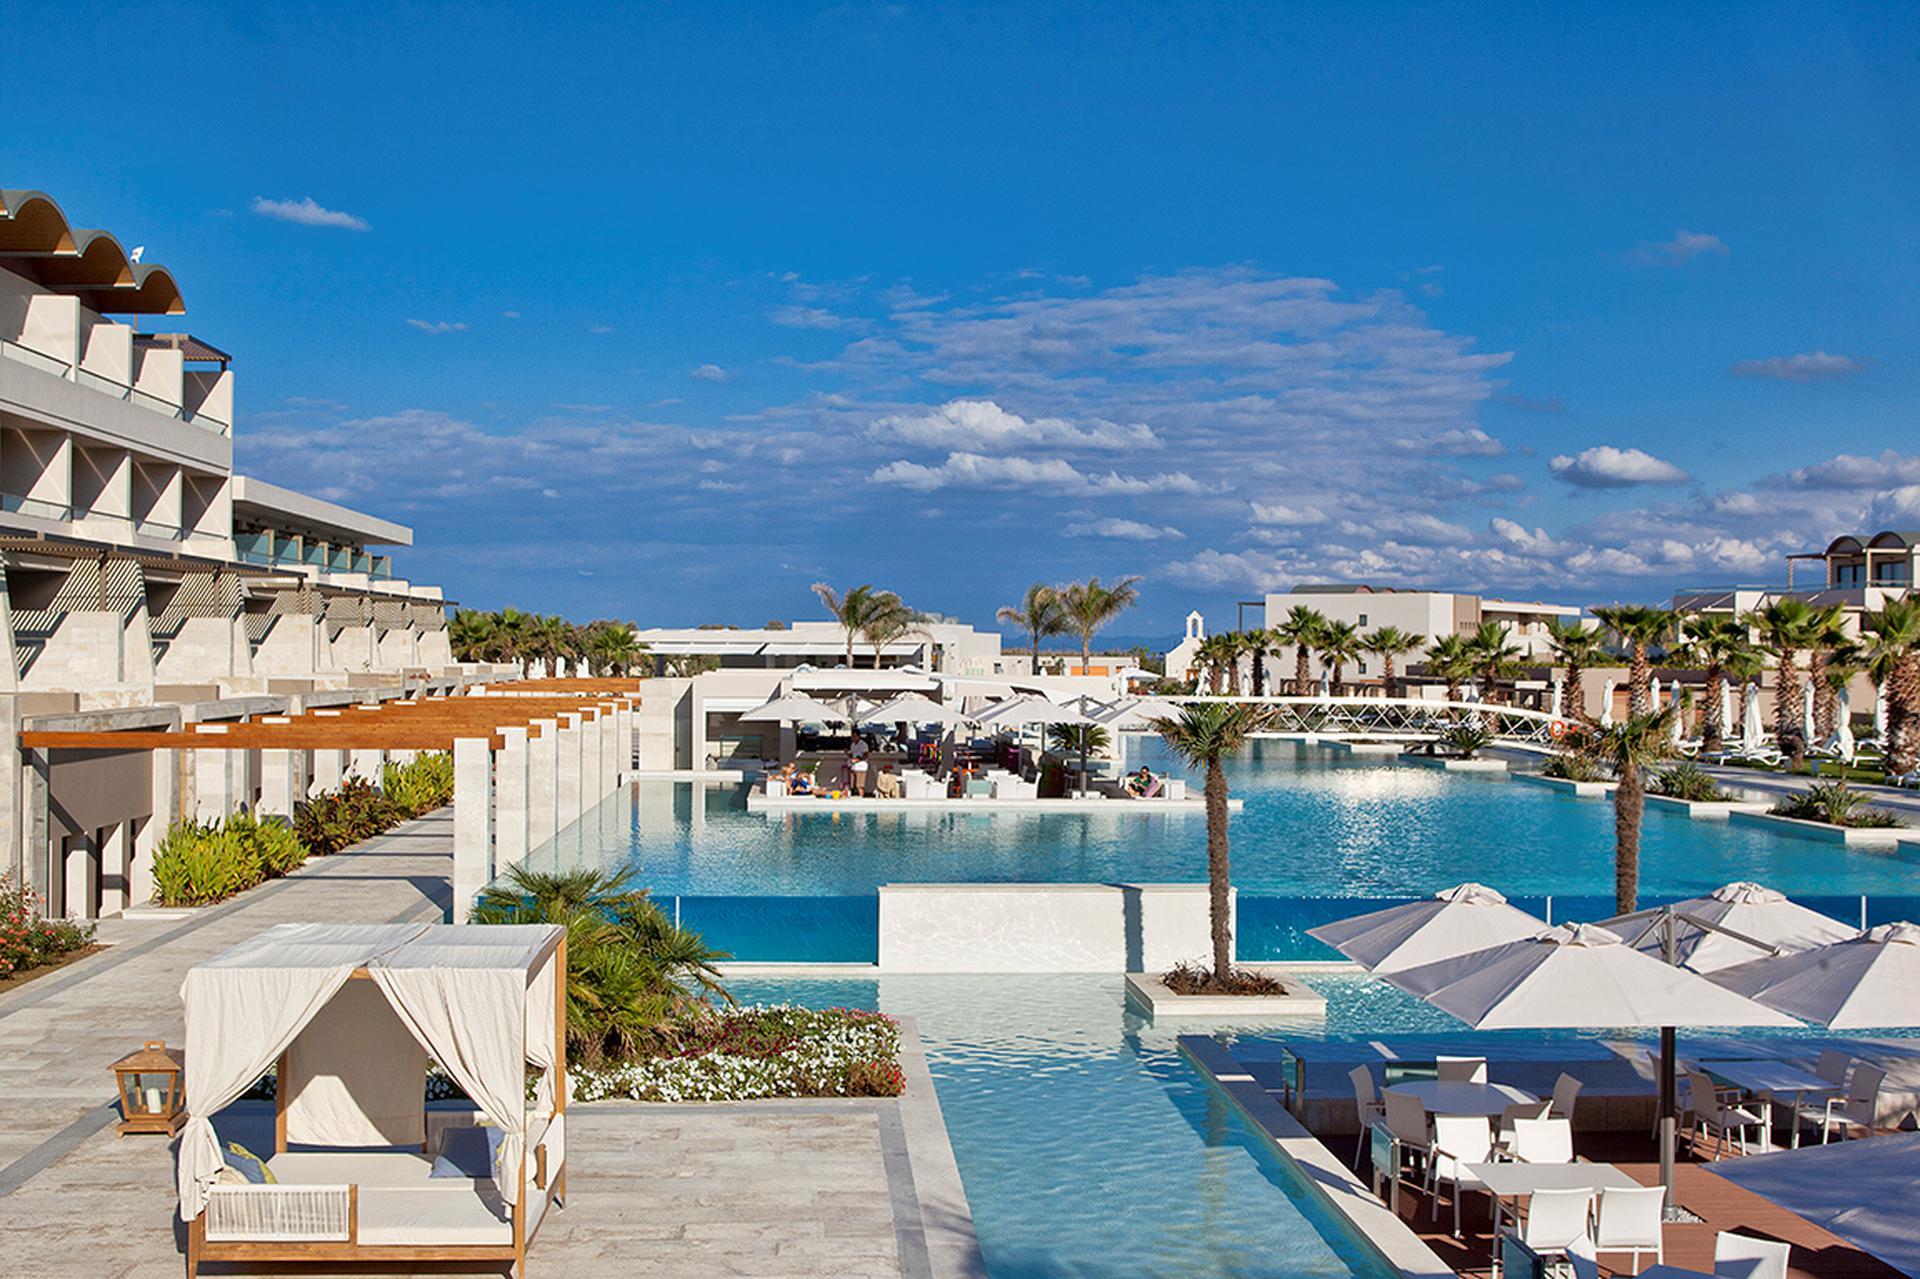 Hotel Avra Beach Rhodos Bewertung